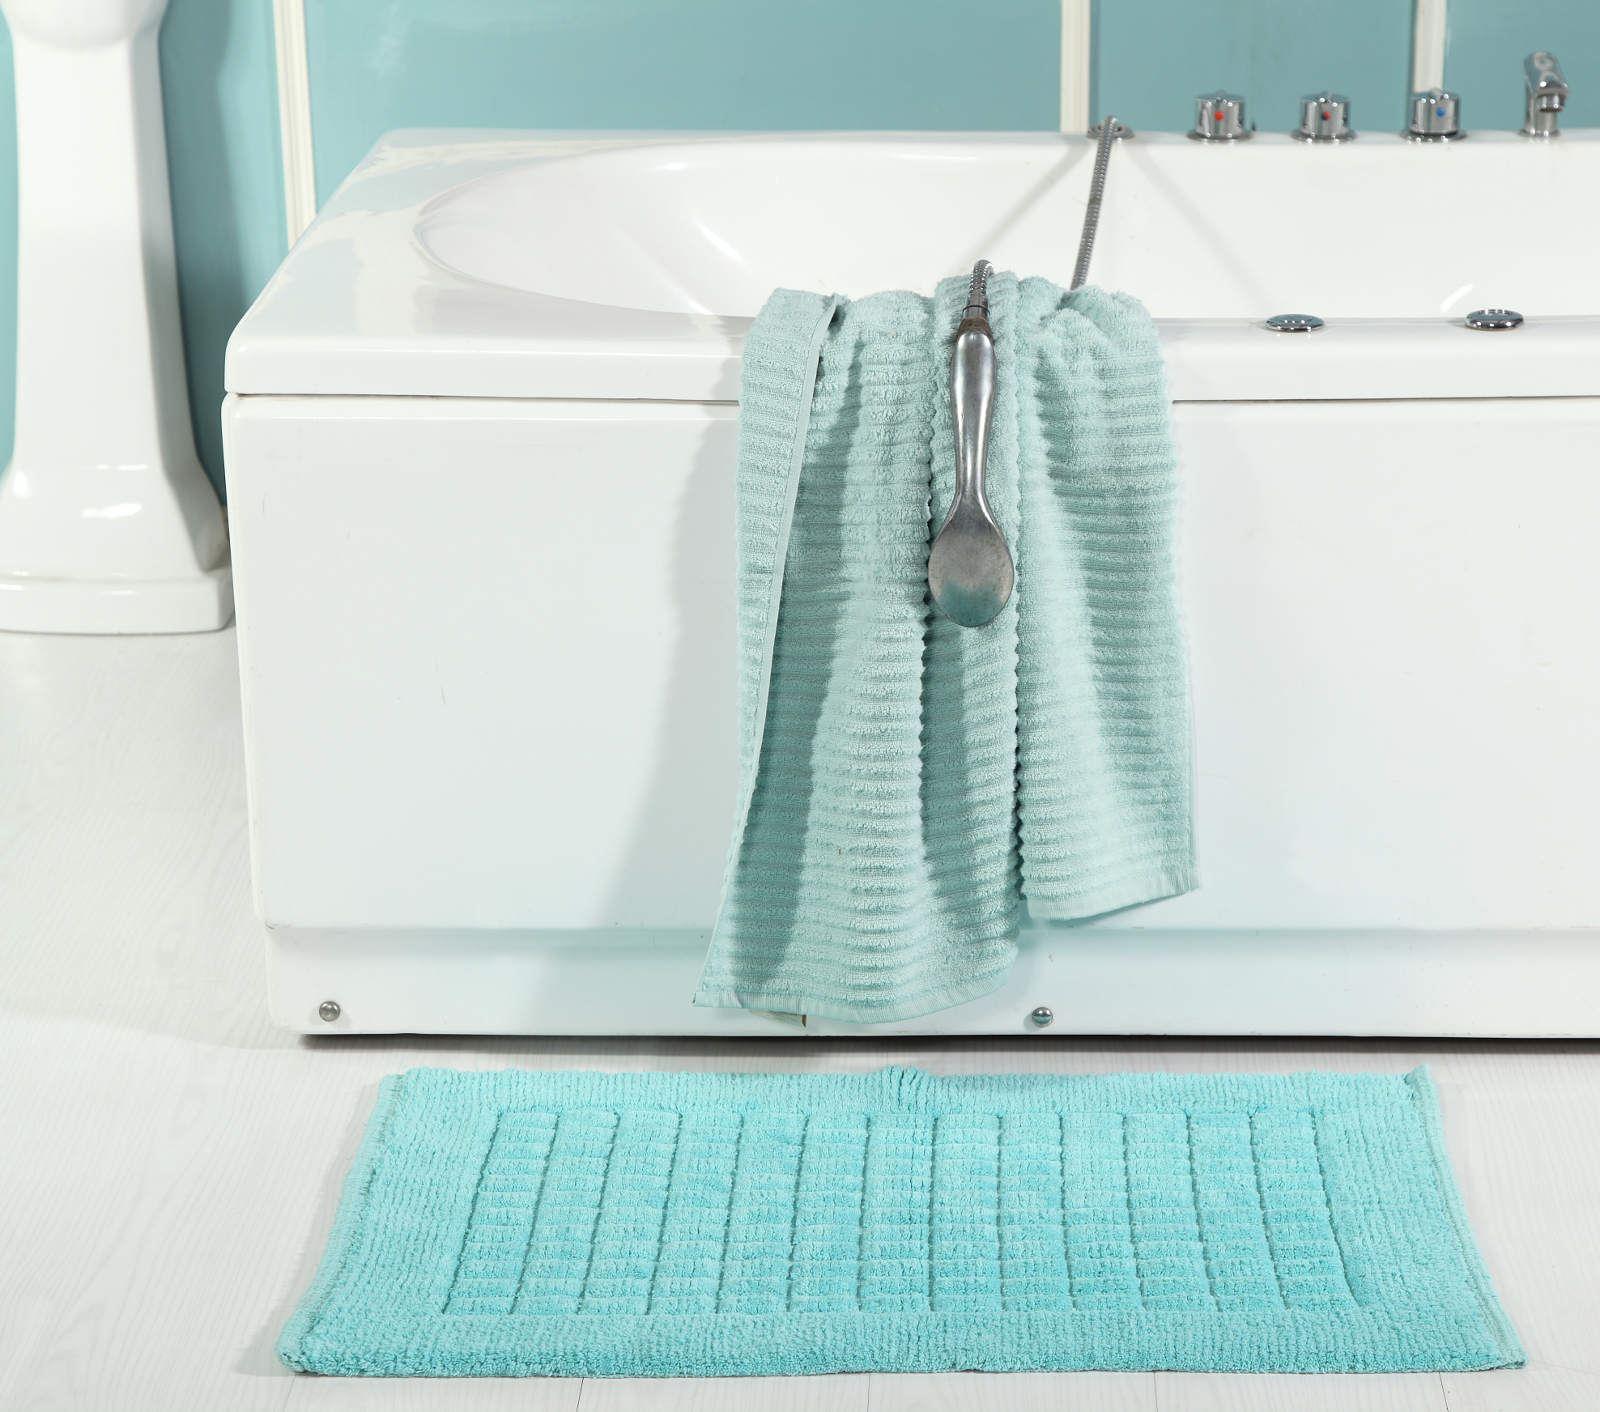 Tapis Salle De Bain Super Absorbant ~ sevilla 100 cotton modern squares bath mat luxury absorbent shower